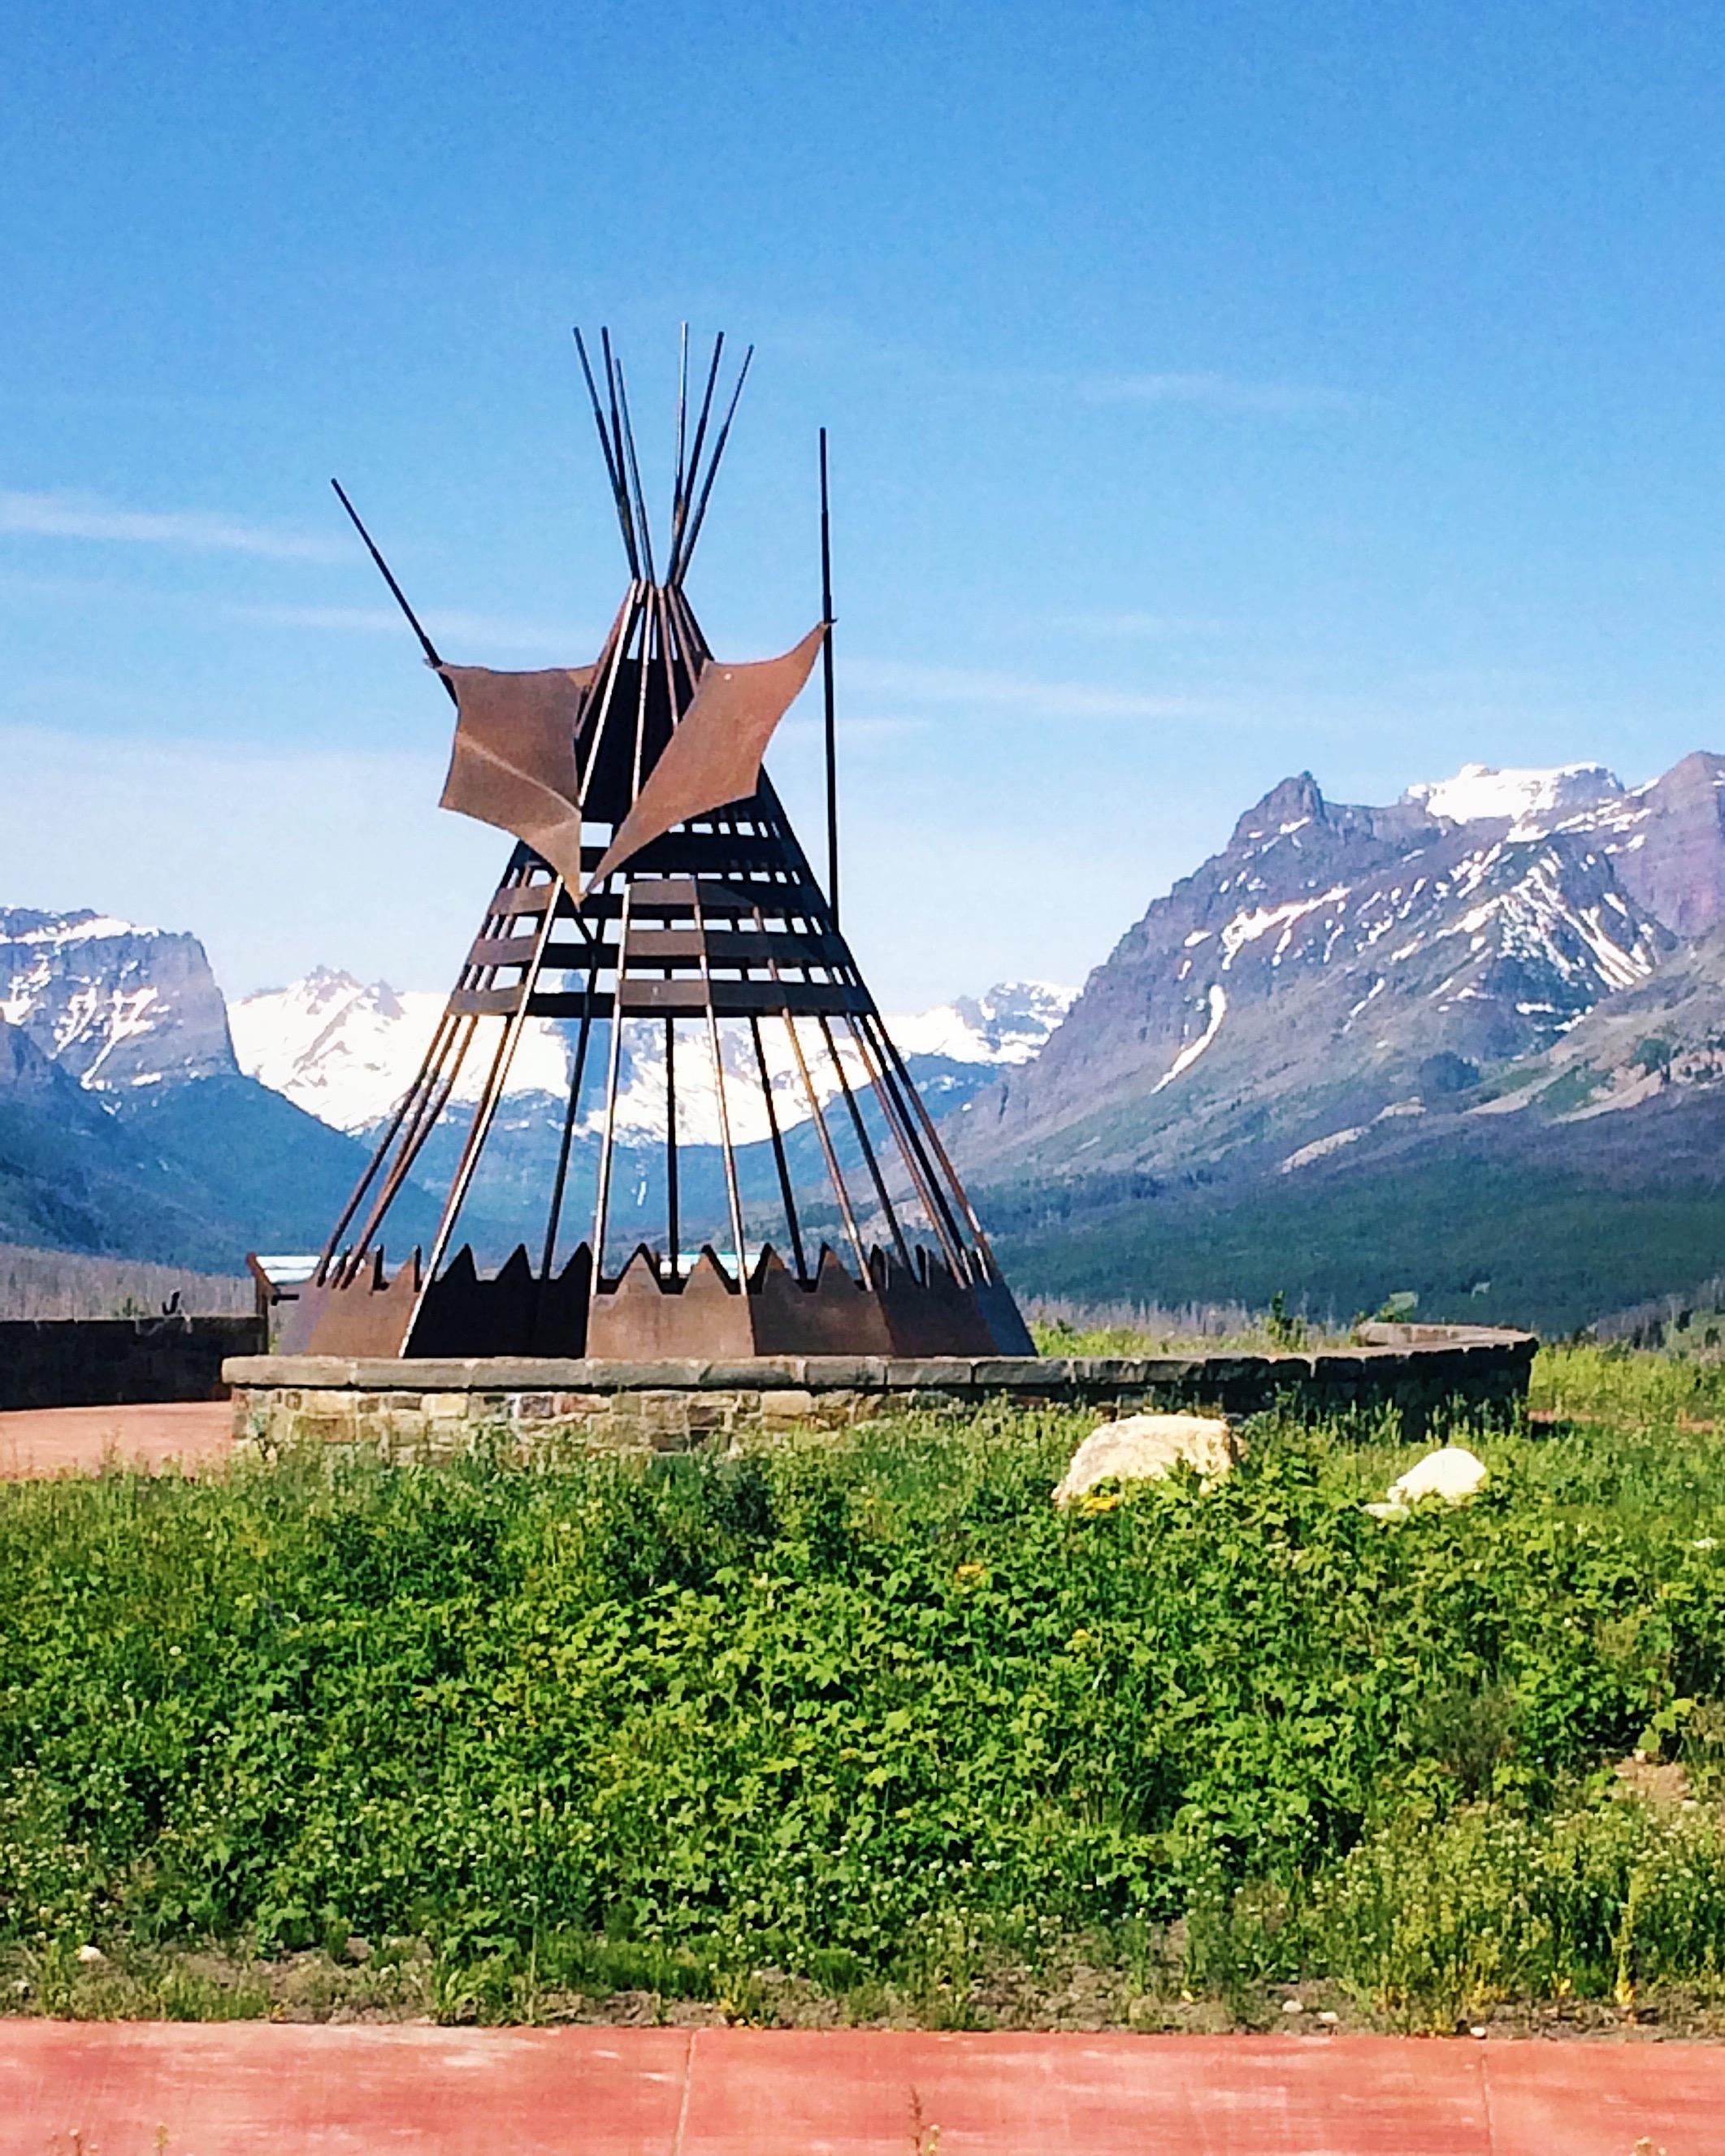 St. Mary Overlook - St. Mary, Montana